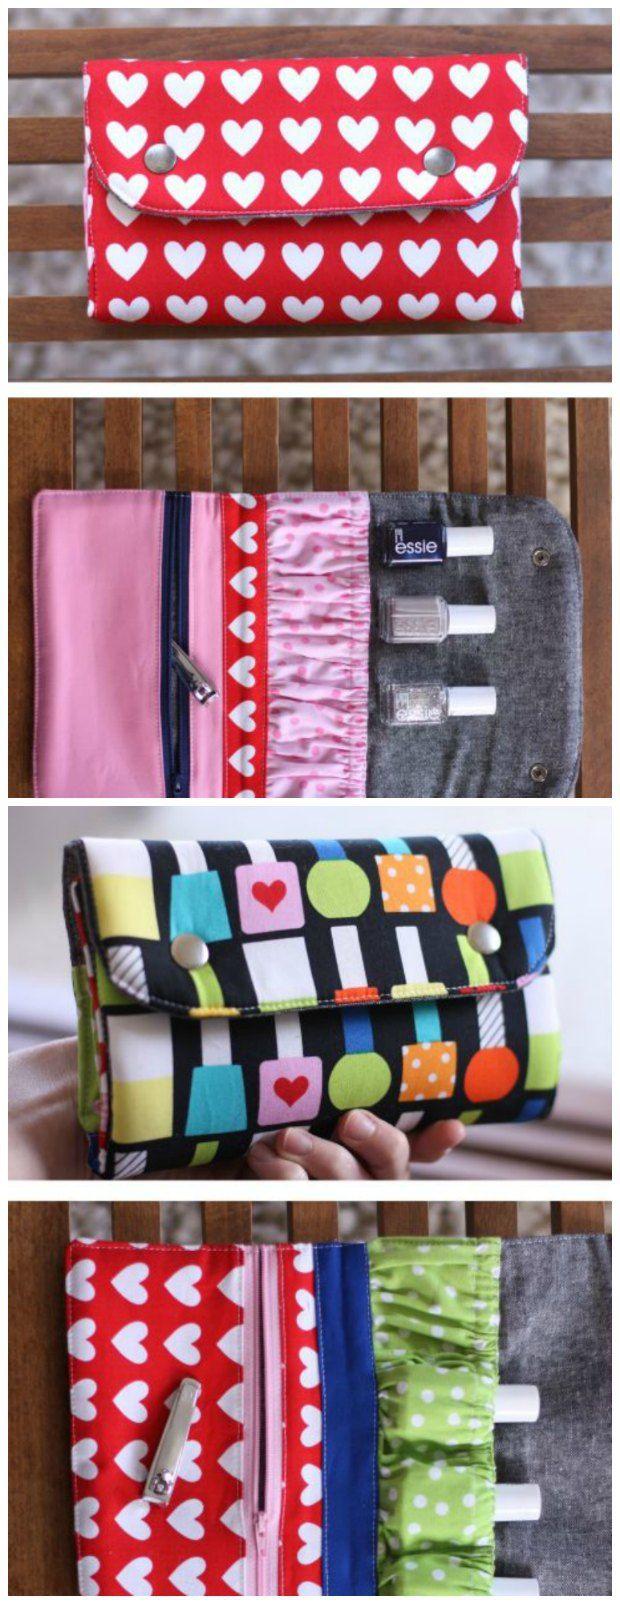 Snappy Mani Pouch - free pattern | Nähen, Nähideen und Taschen nähen